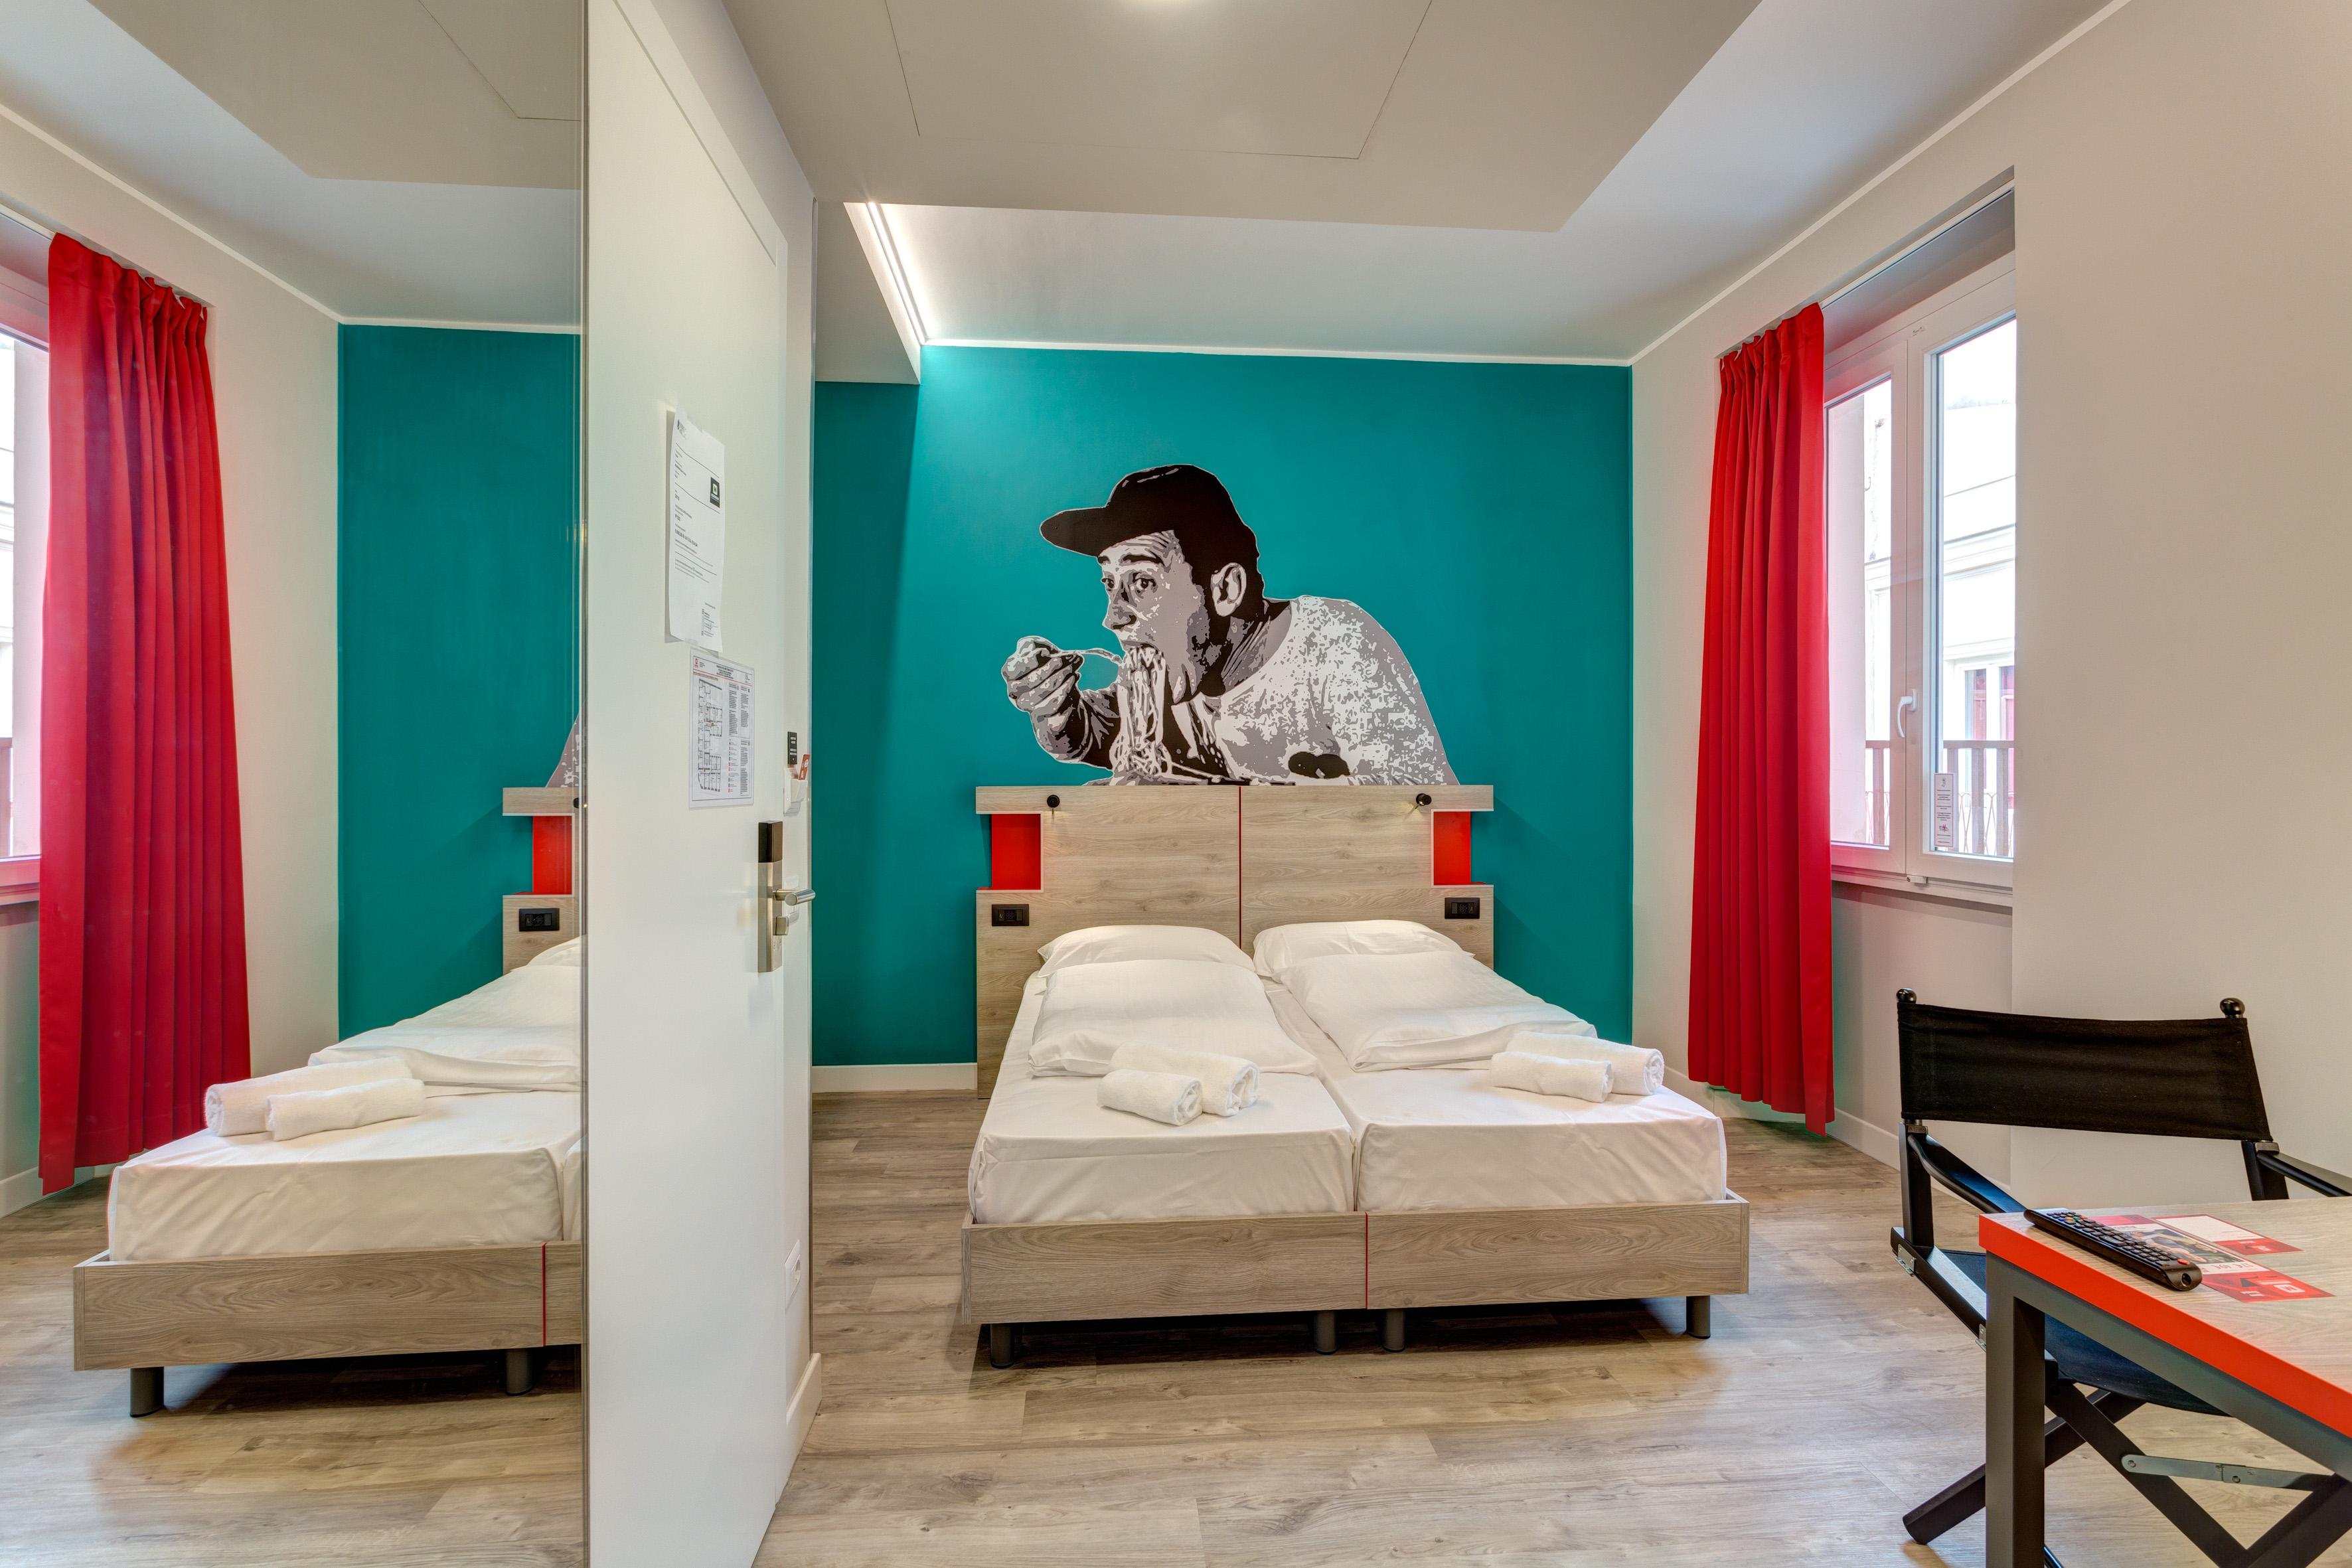 MEININGER Roma Termini - Een-/ Tweepersoonskamer